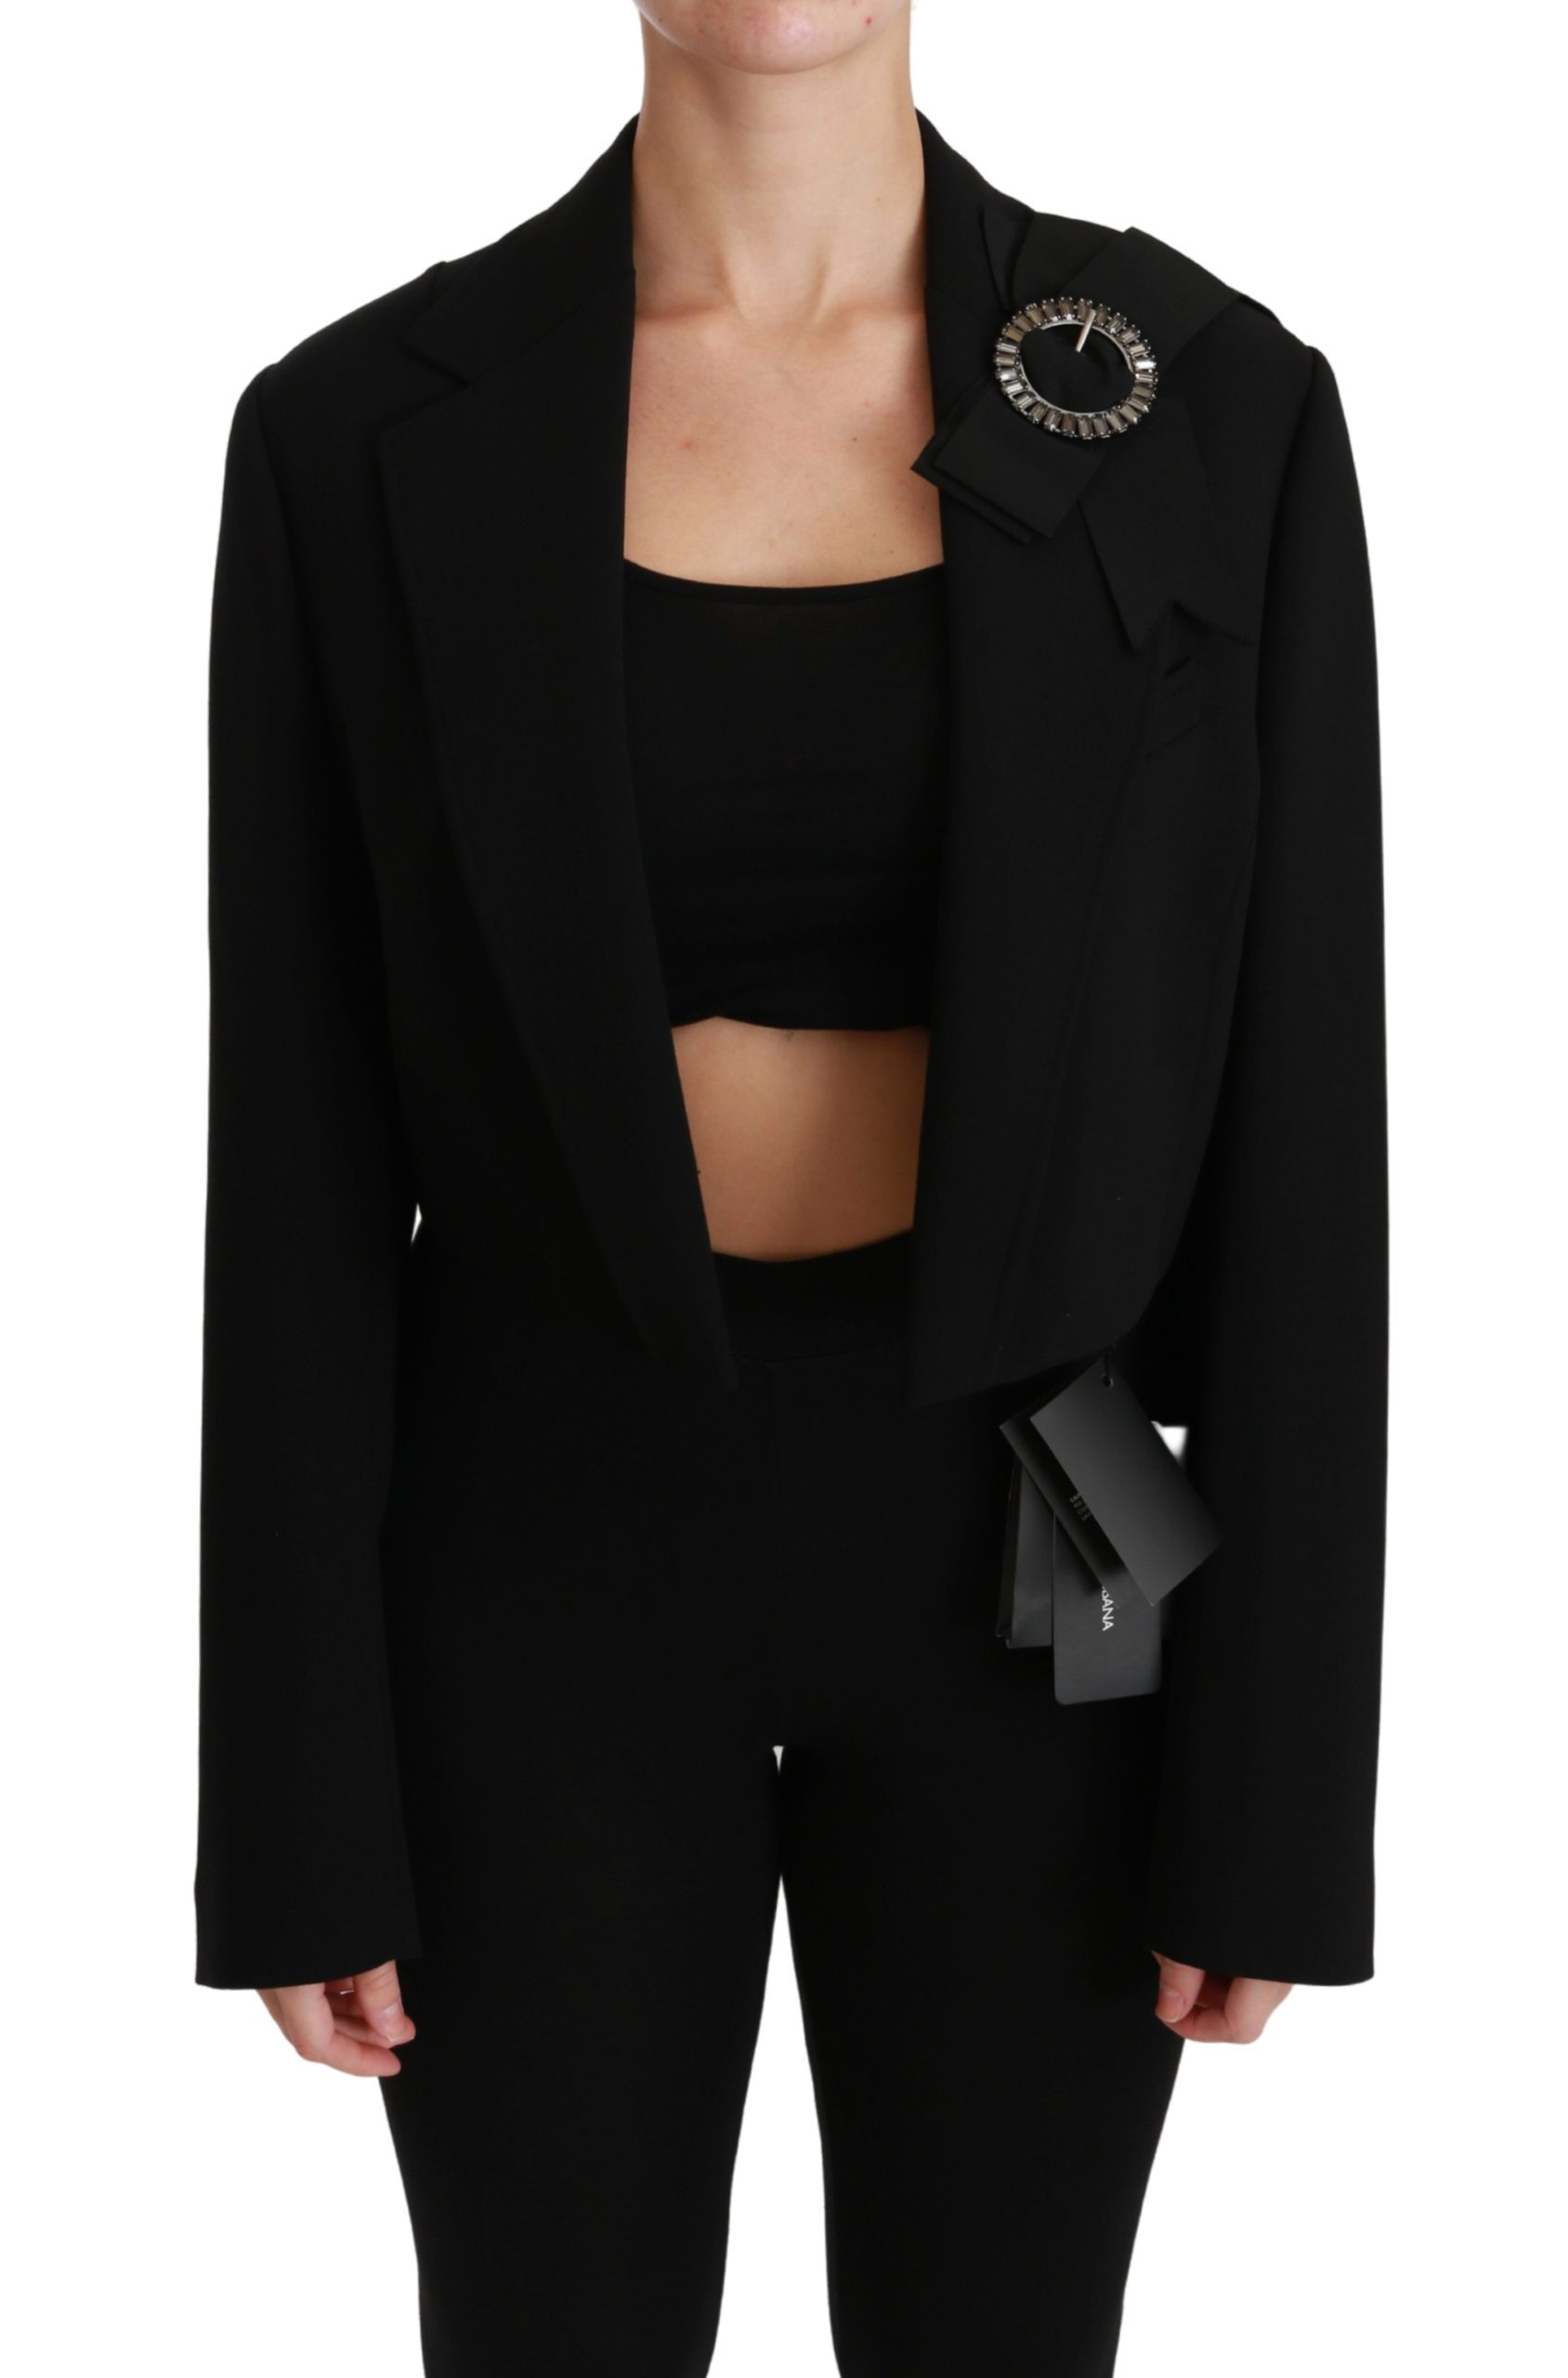 Dolce & Gabbana Women's Cropped Wool Stretch Blazer Black JKT2536 - IT44 L